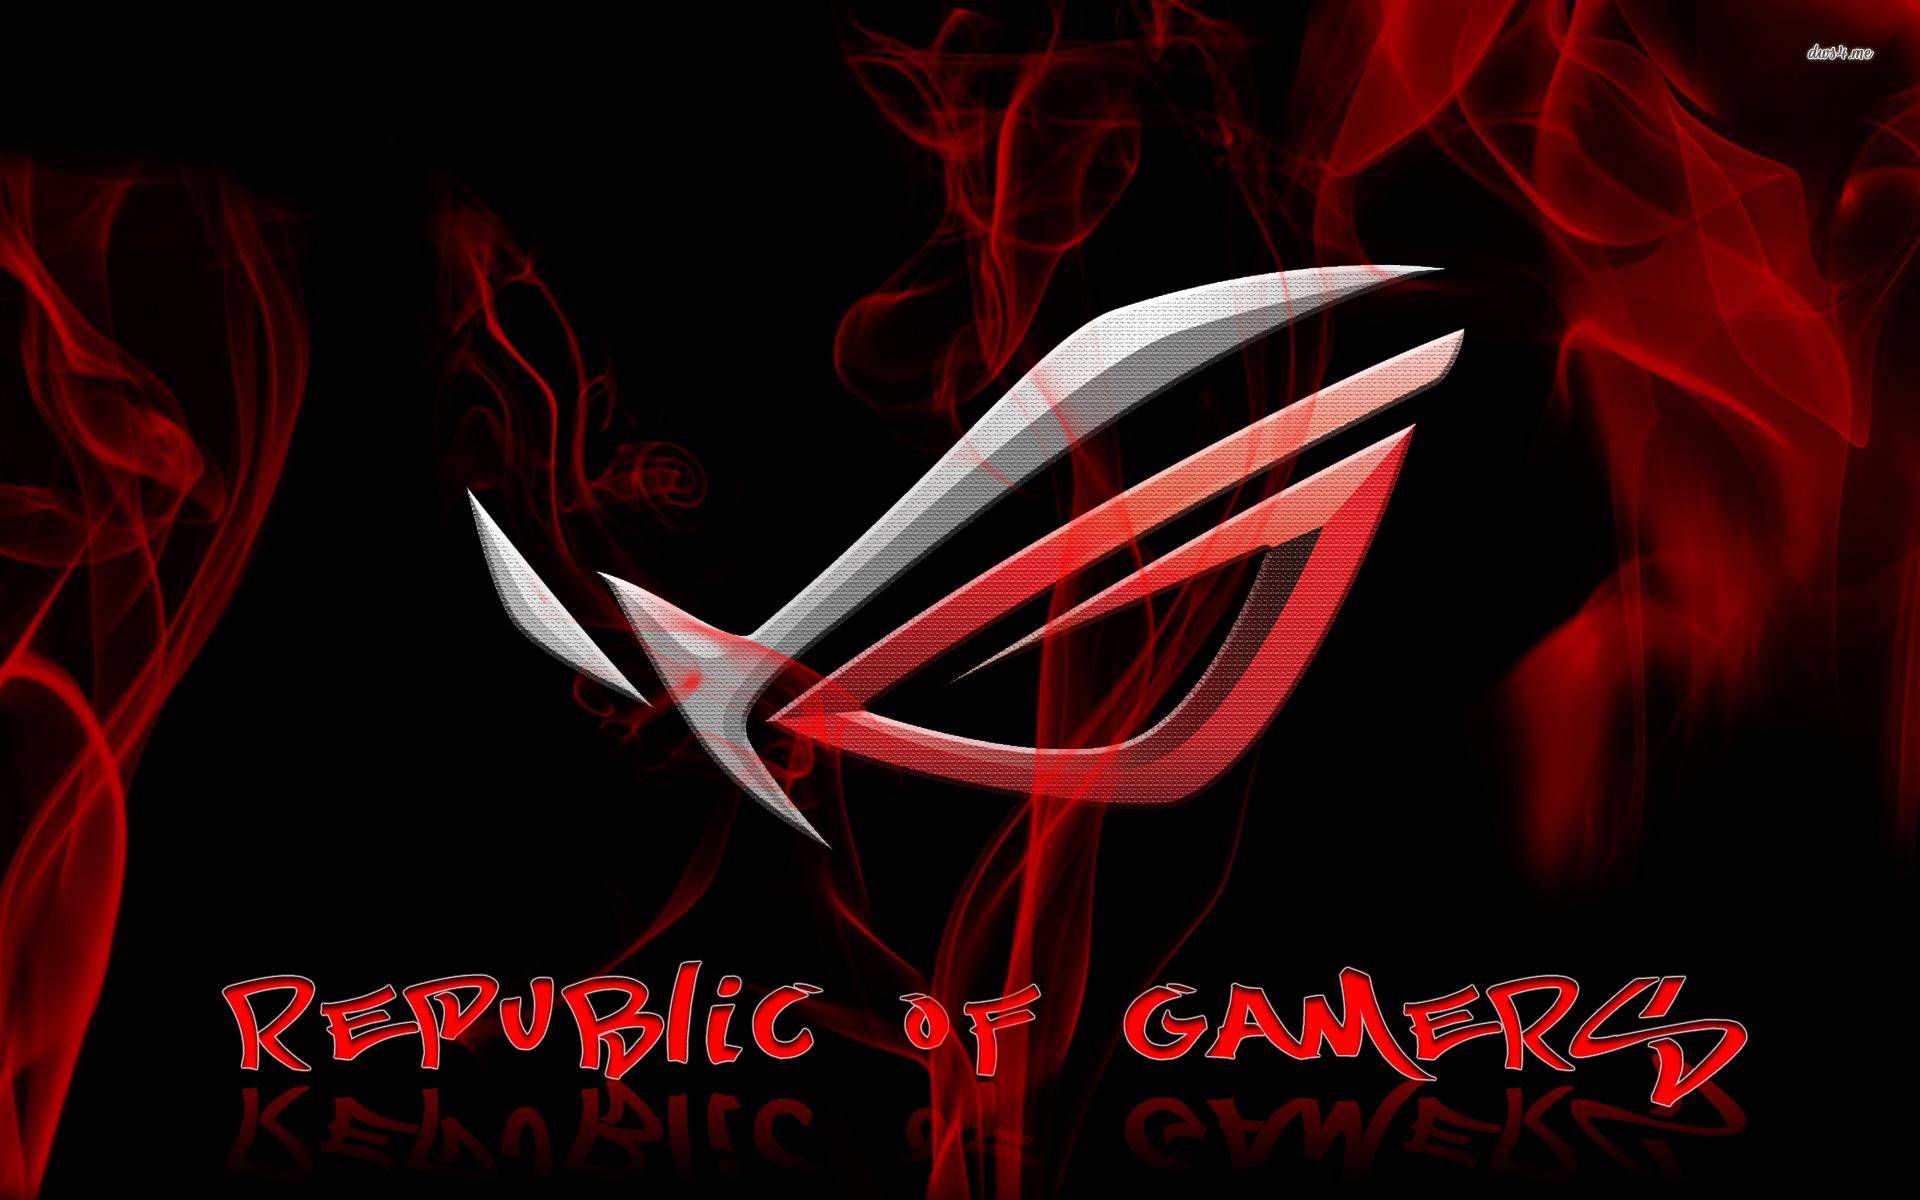 Republic Of Gamers wallpaper 256068 1920x1200